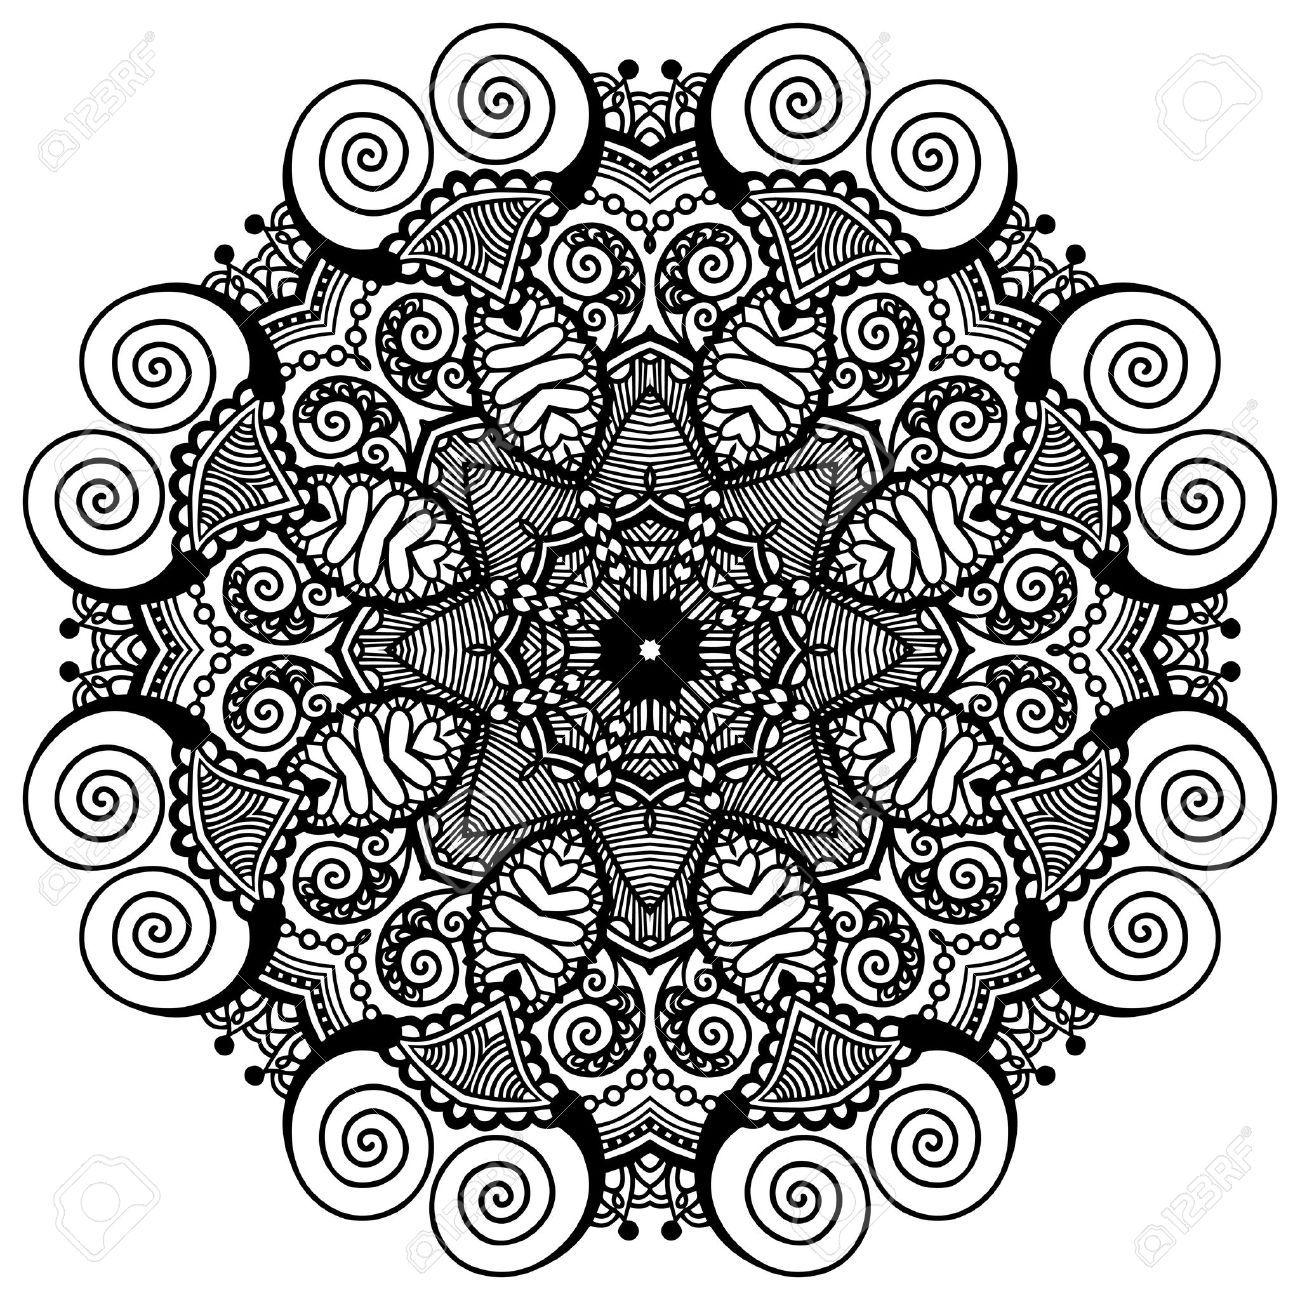 21960366-Circle-lace-ornament-round-ornamental-geometric-doily-pattern--Stock-Photo.jpg (1300×1300)